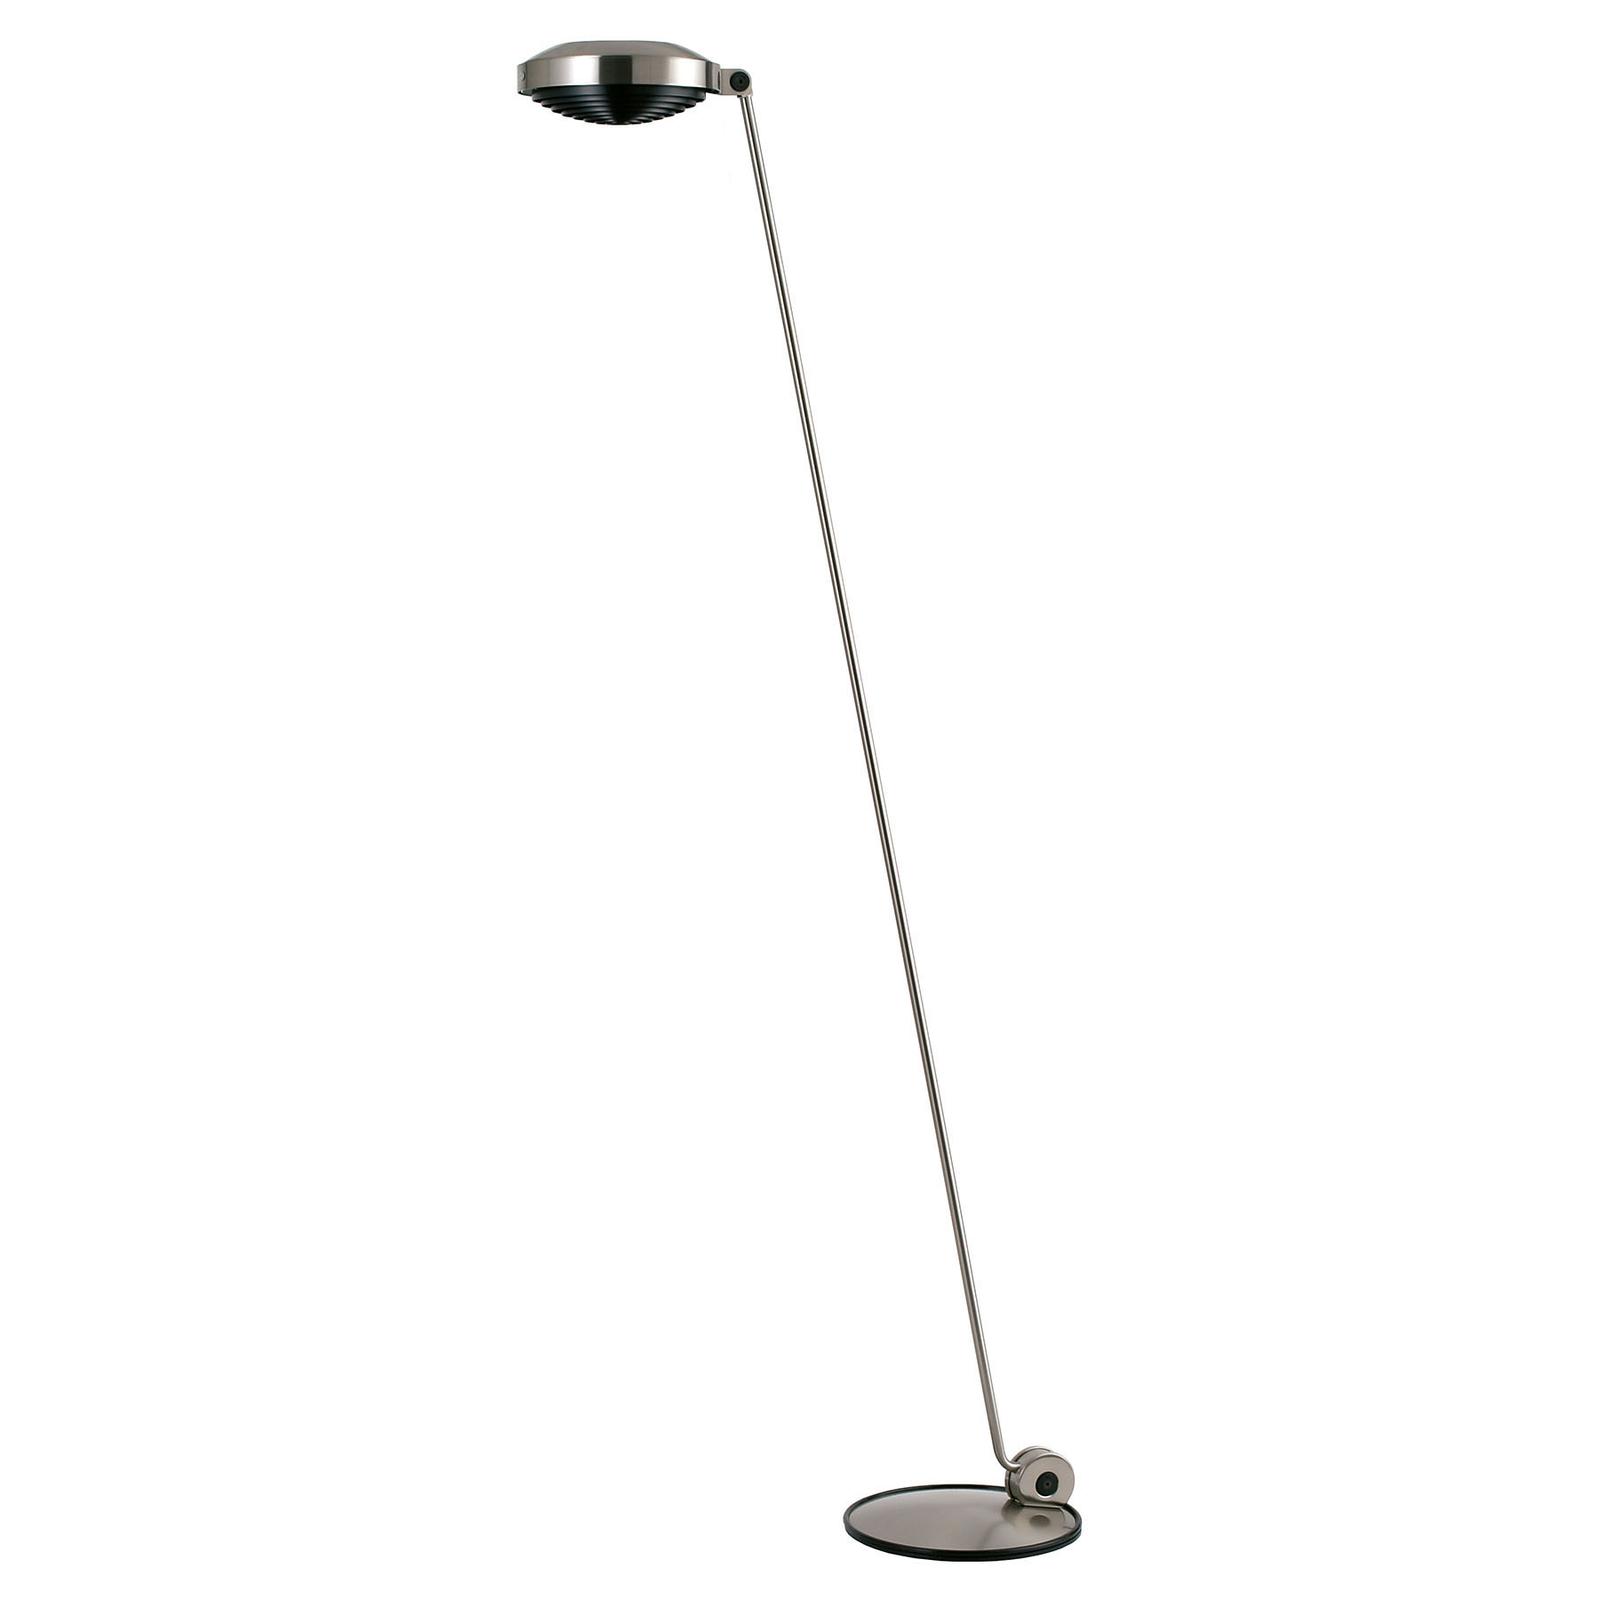 Lumina Elle 1 piantana LED H 180cm 3.000K nichel